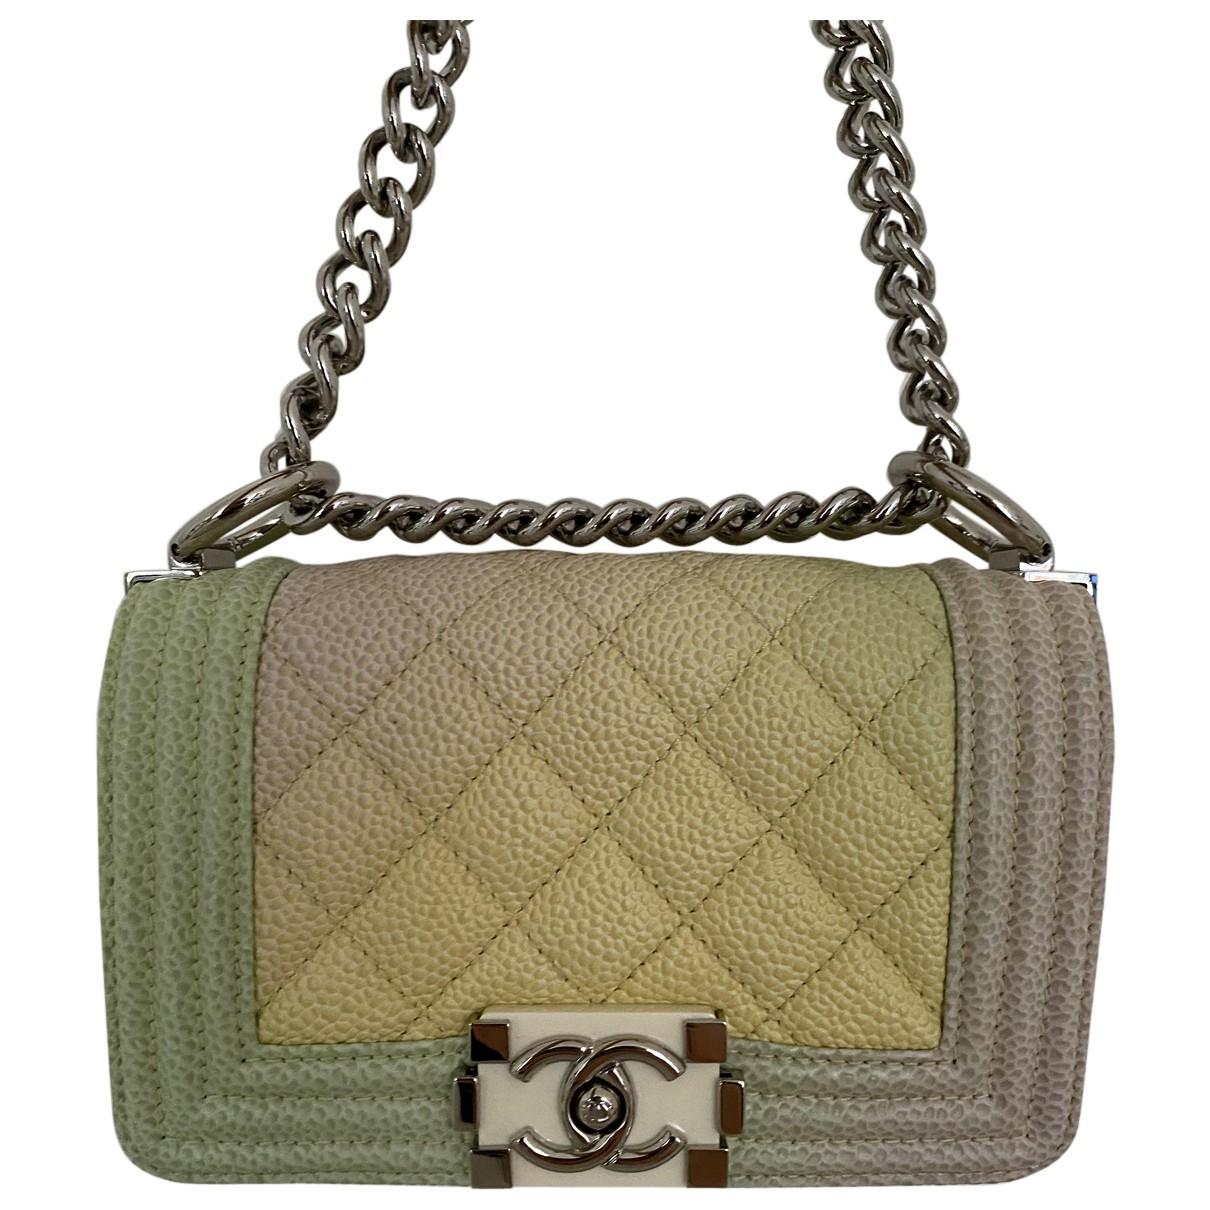 Chanel Boy Multicolour Leather handbag for Women N